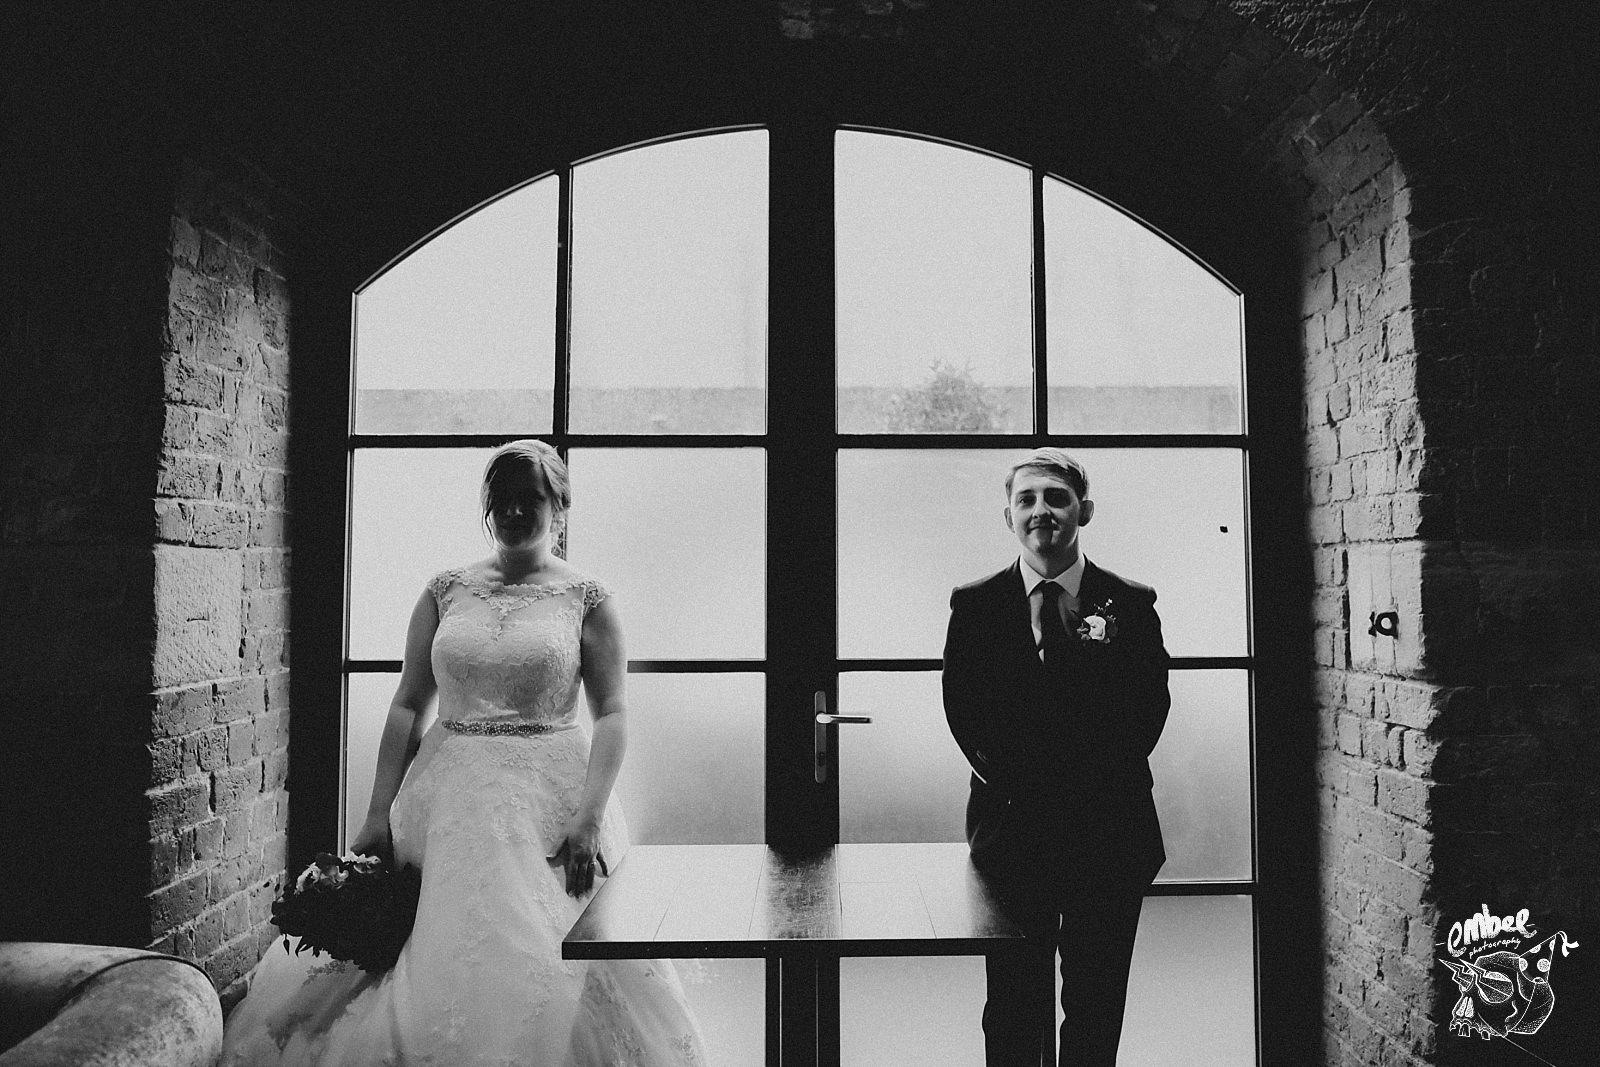 creative shot of bride and groom